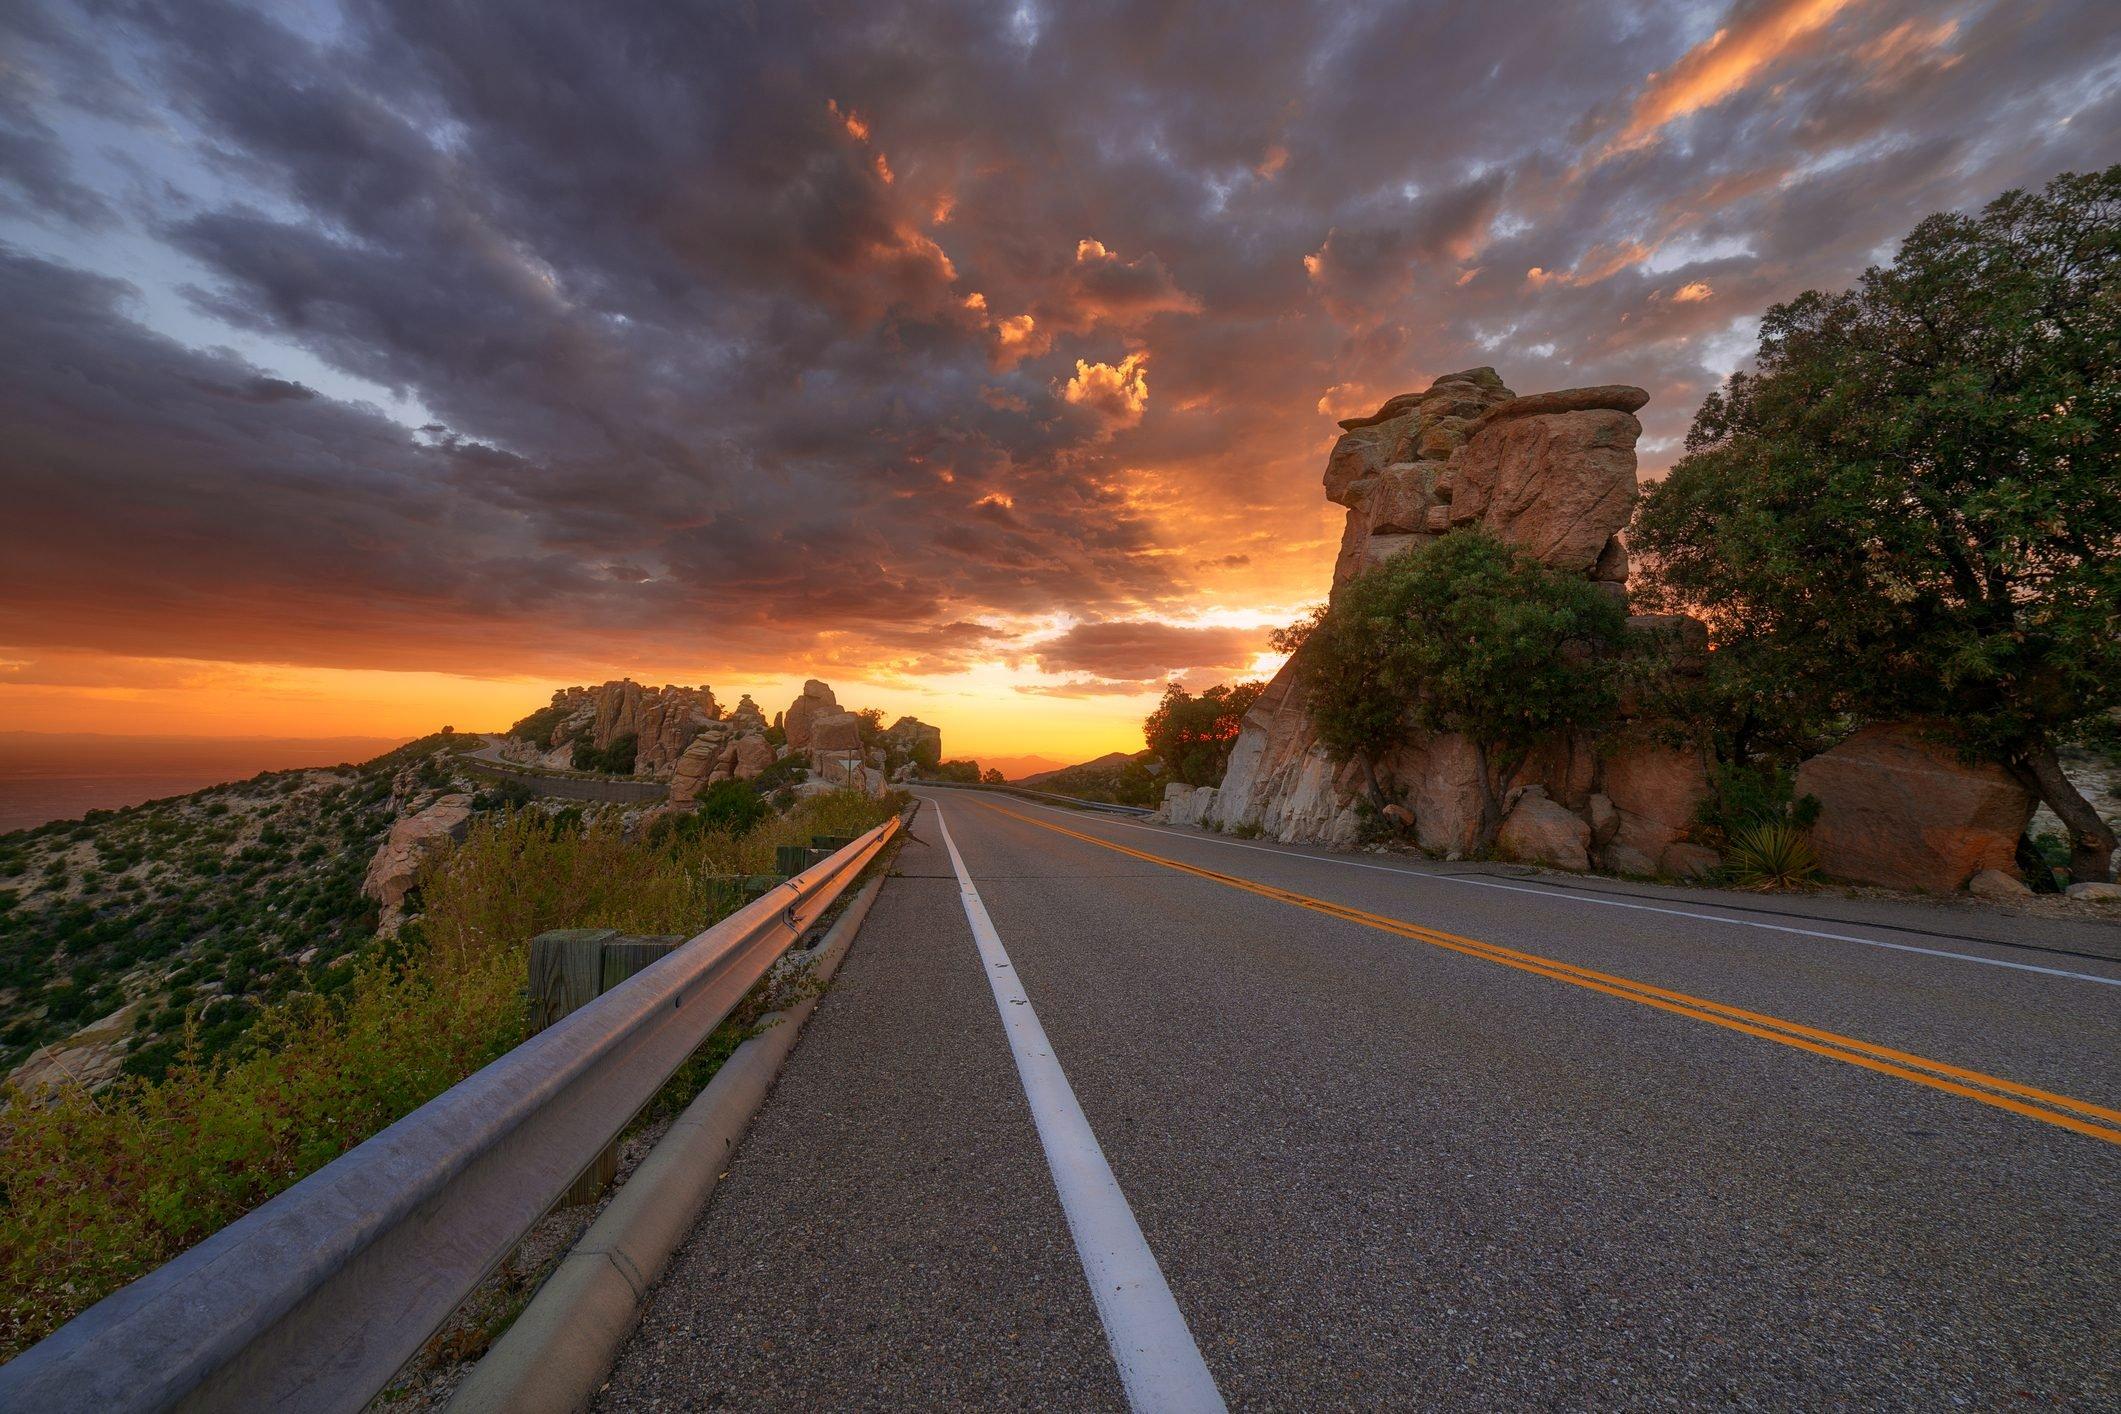 Colorful sunset sky over the Catalina Highway on Mt. Lemmon near Tucson, Arizona.